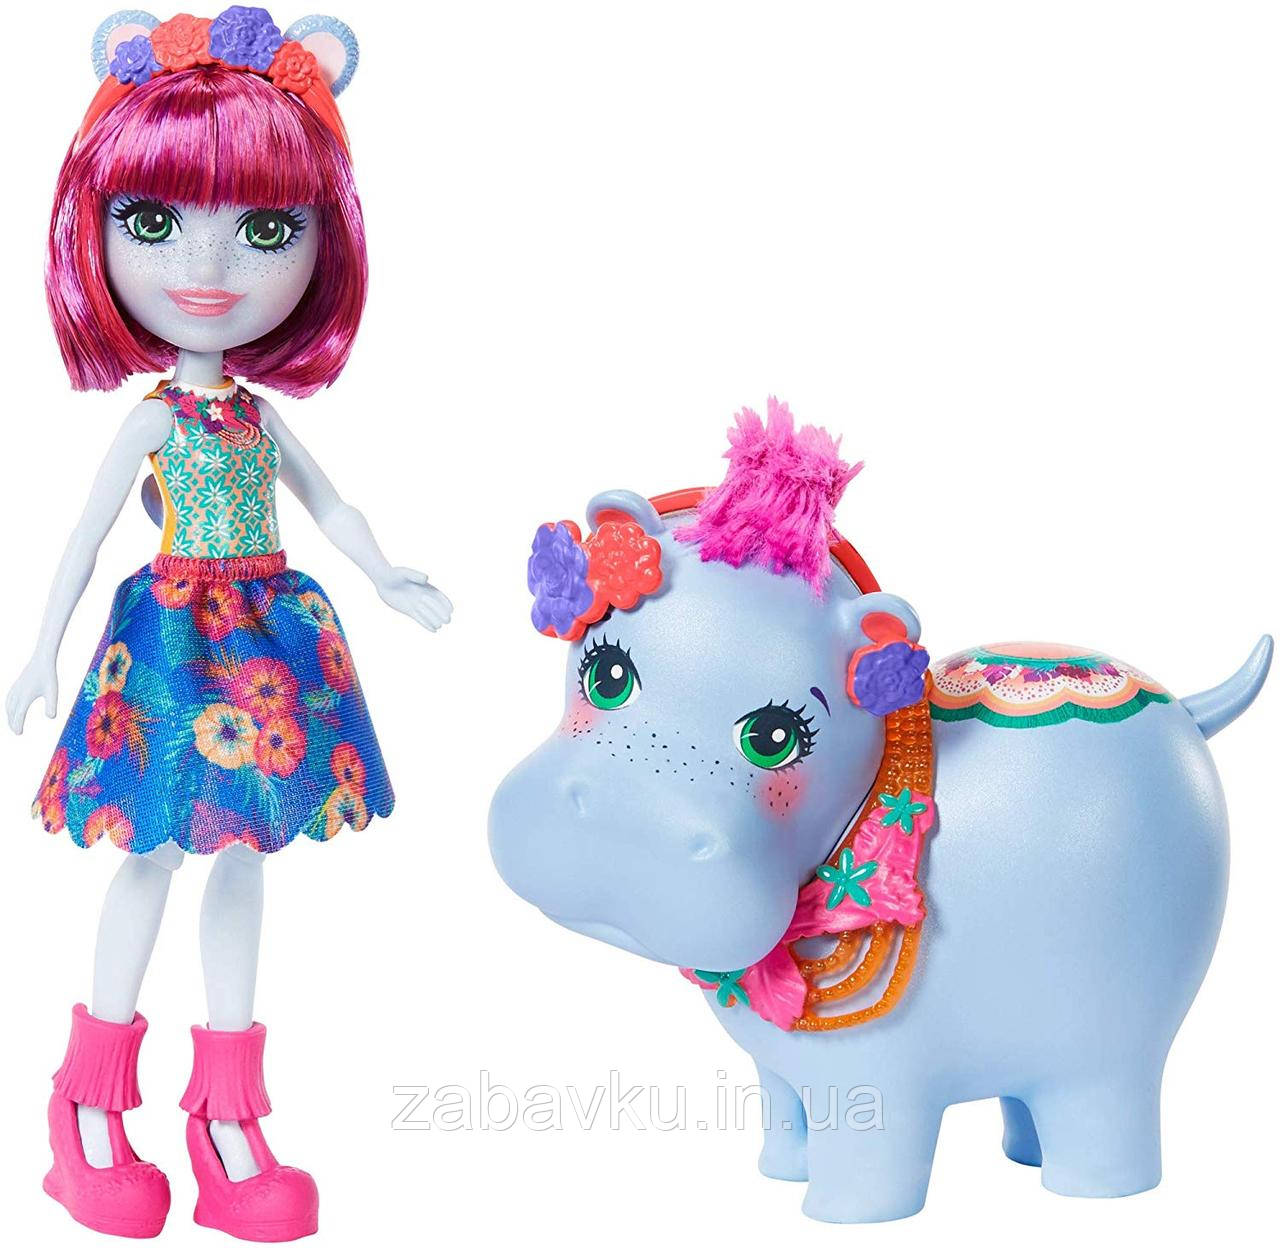 Лялька Енчантімалс Бегемотик , Enchantimals Hedda Hippo & Lake Dolls